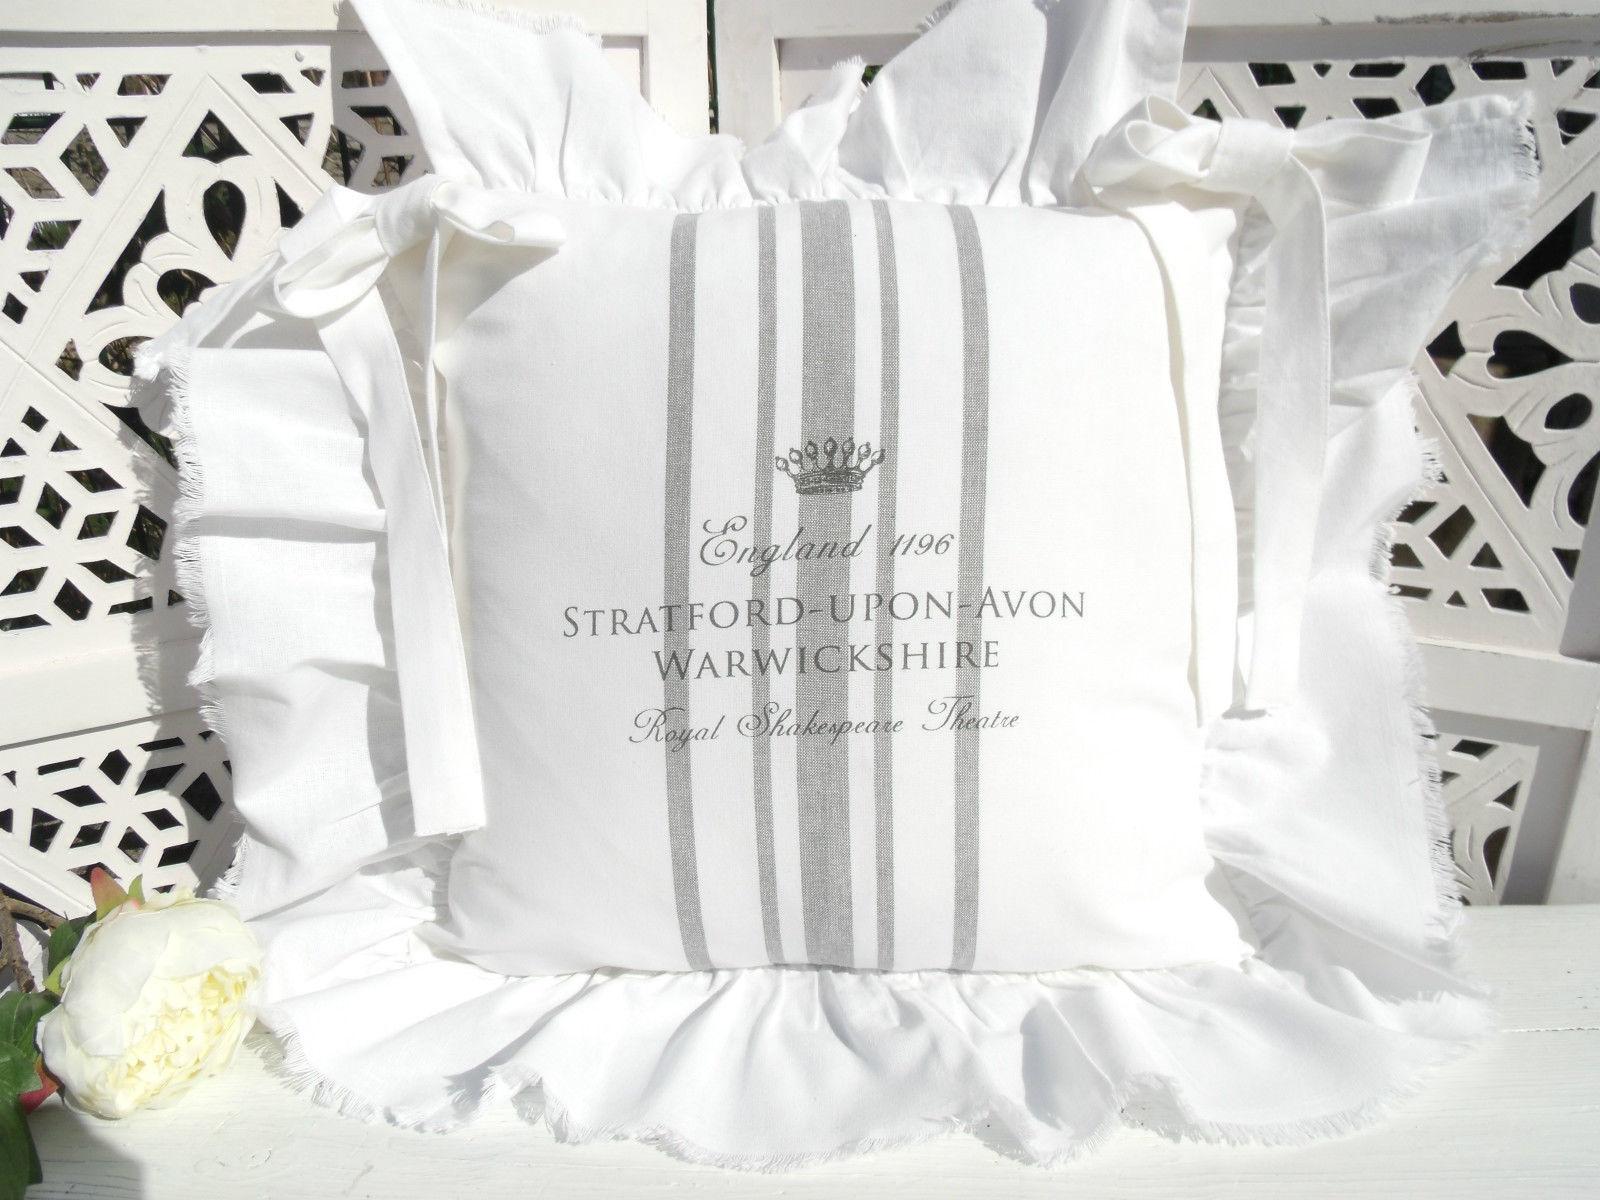 Stuhlkissenbezug Stratford Weiss Grau 40x40 Cm Shabby Chic Vintage Baumwolle